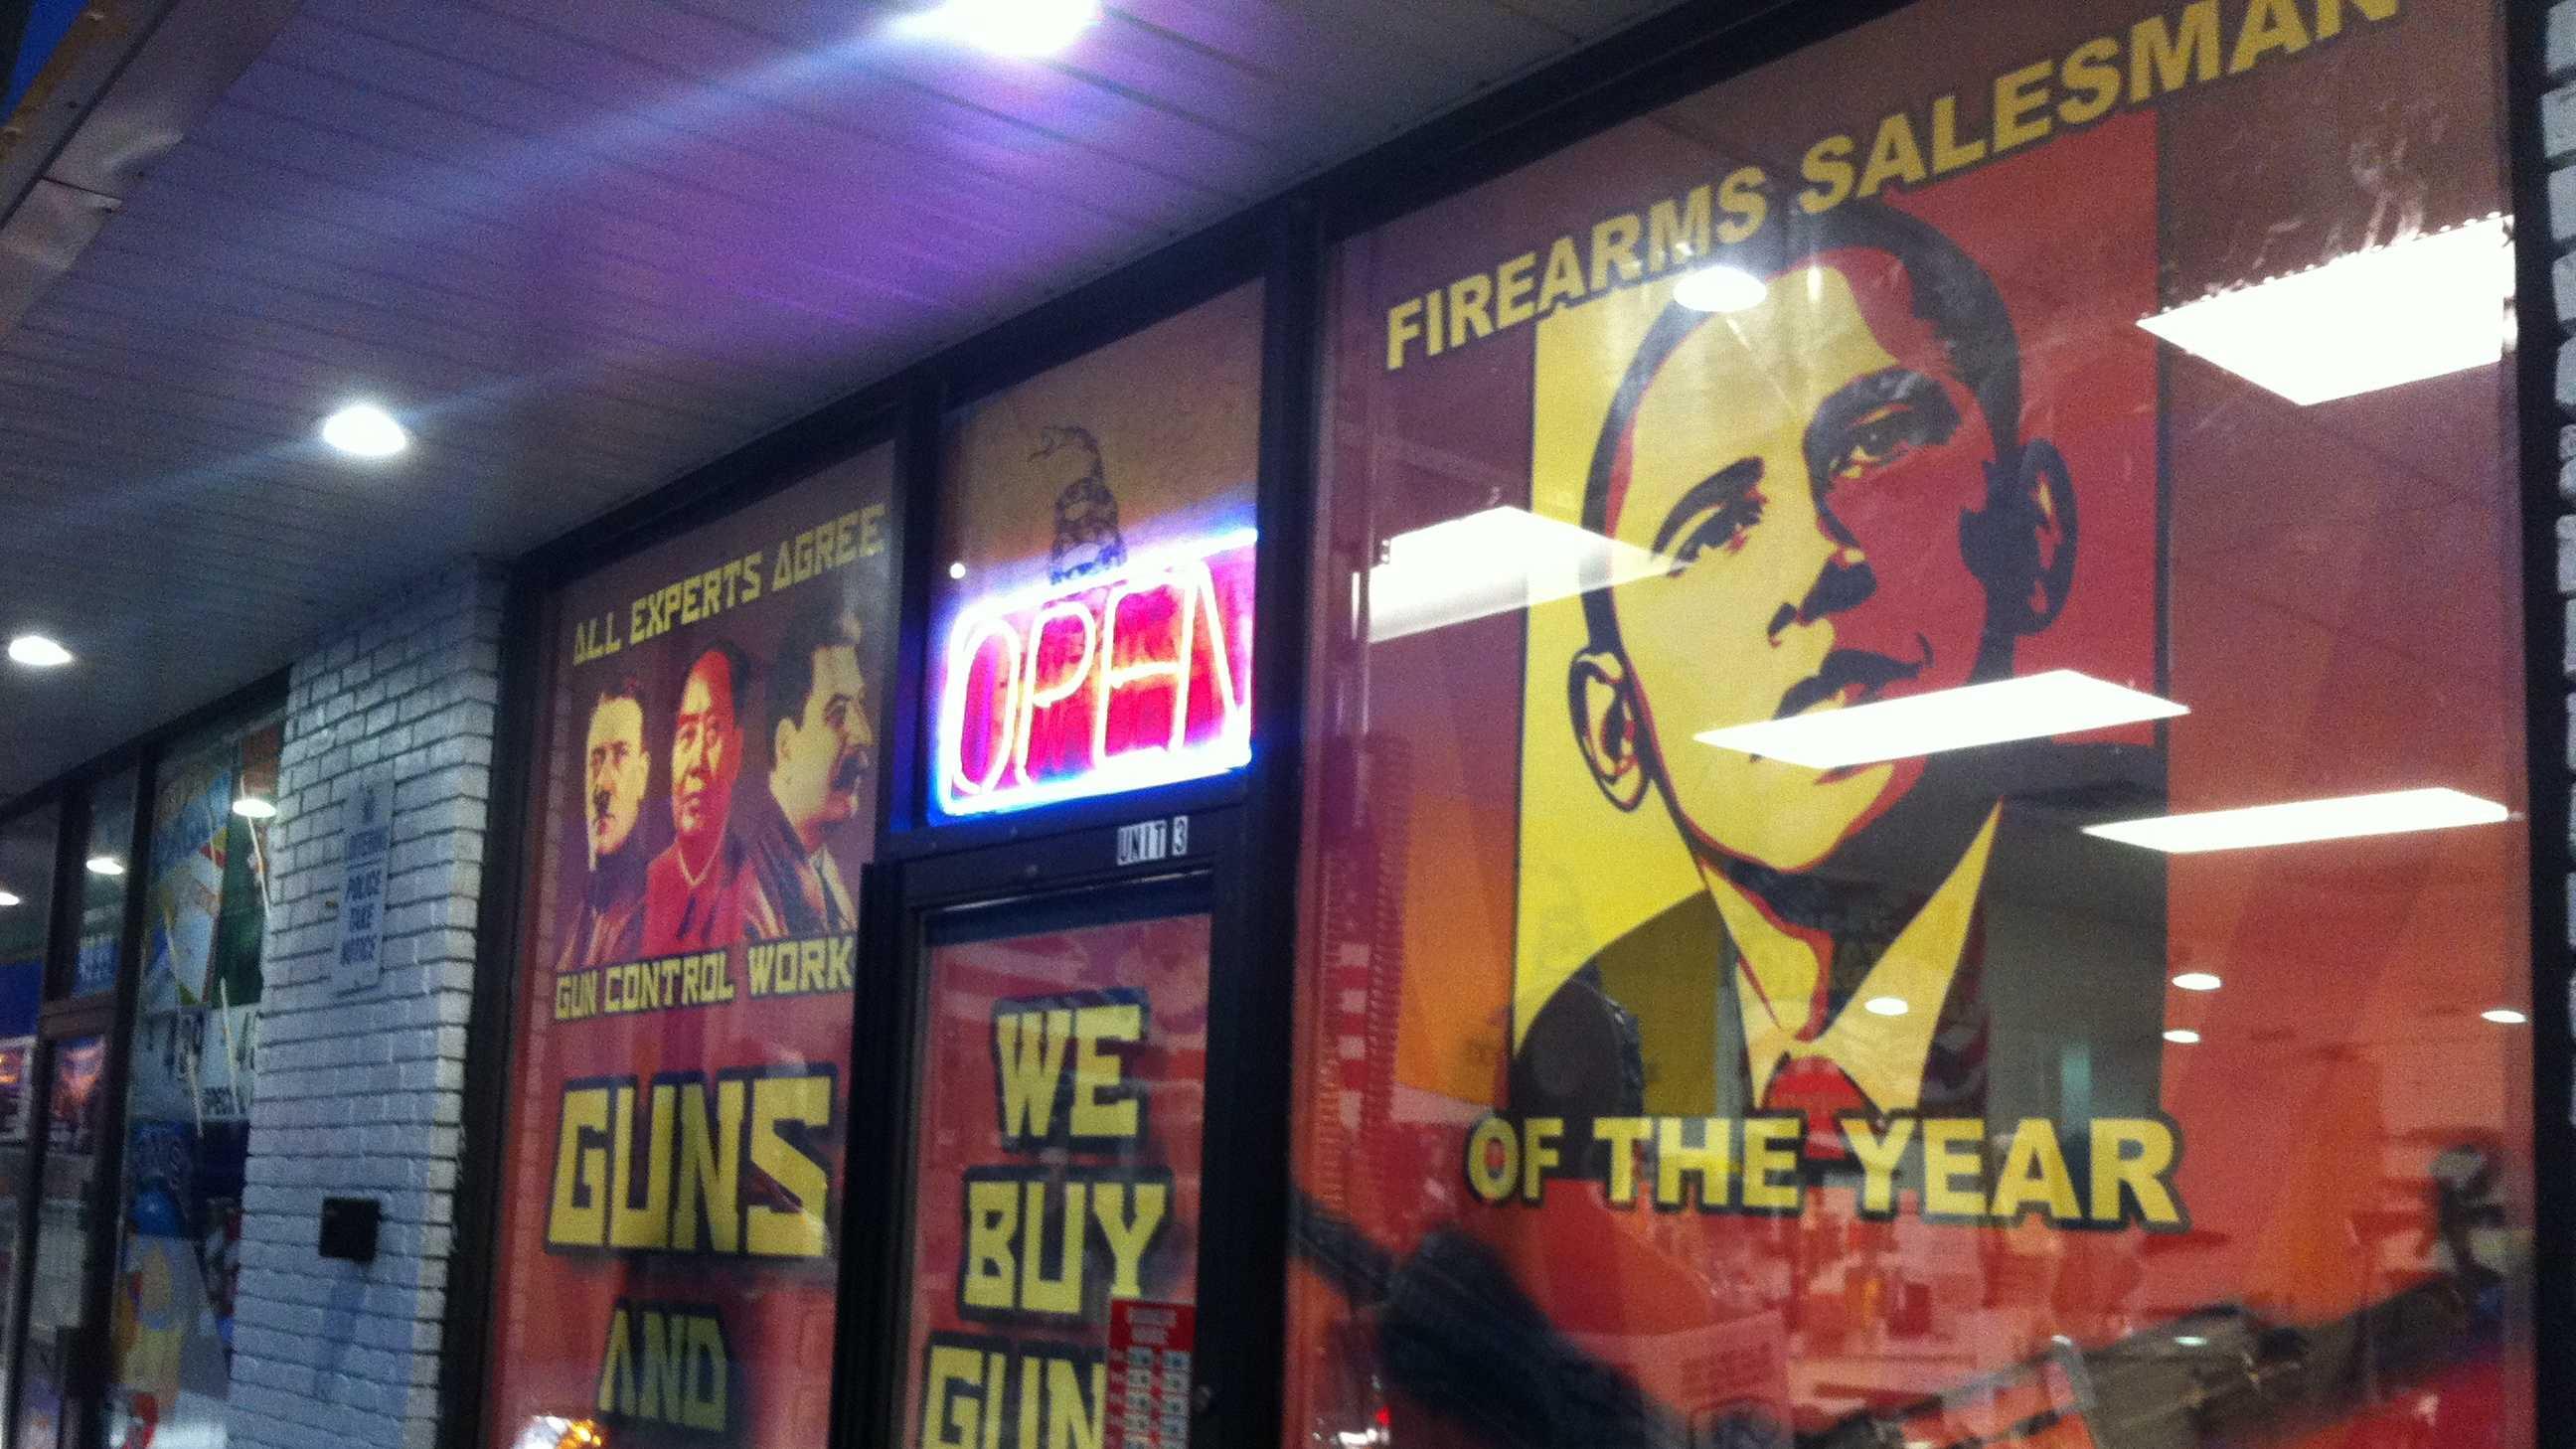 Merrimack Gun shop poster